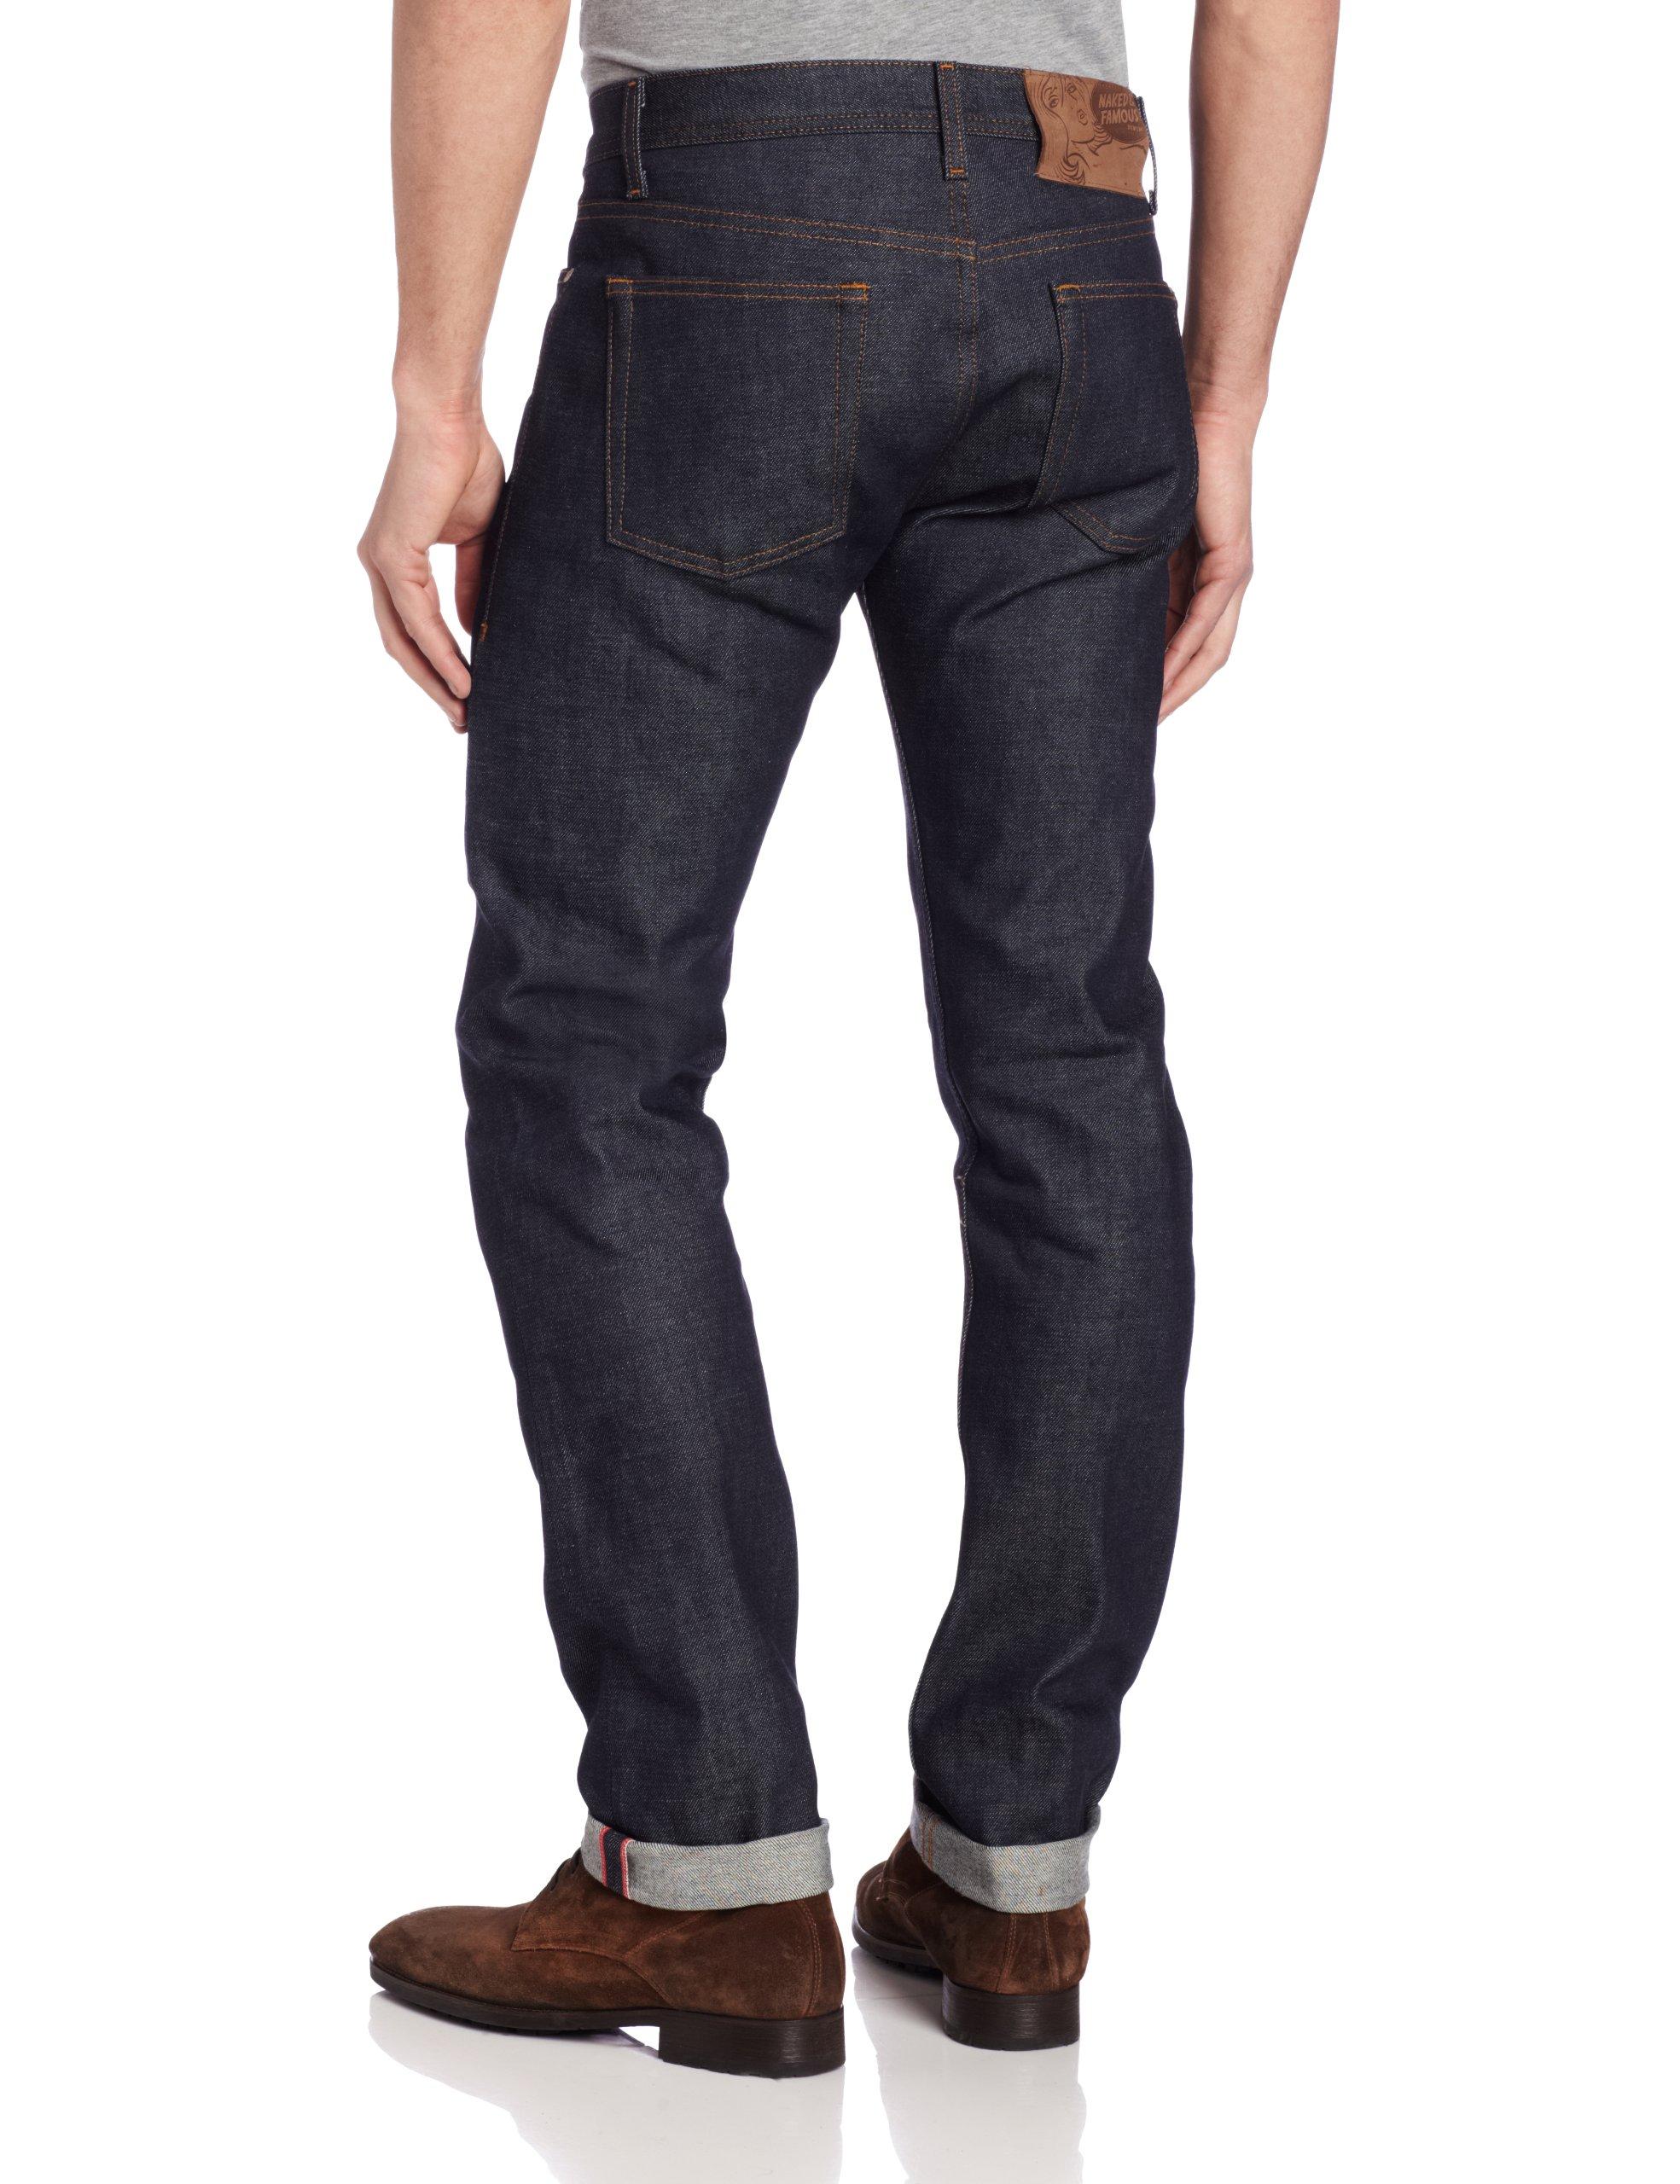 c64b6731 Men's Weird Guy Low-Rise Jean in Dirty Fade Selvedge - Denim Fit